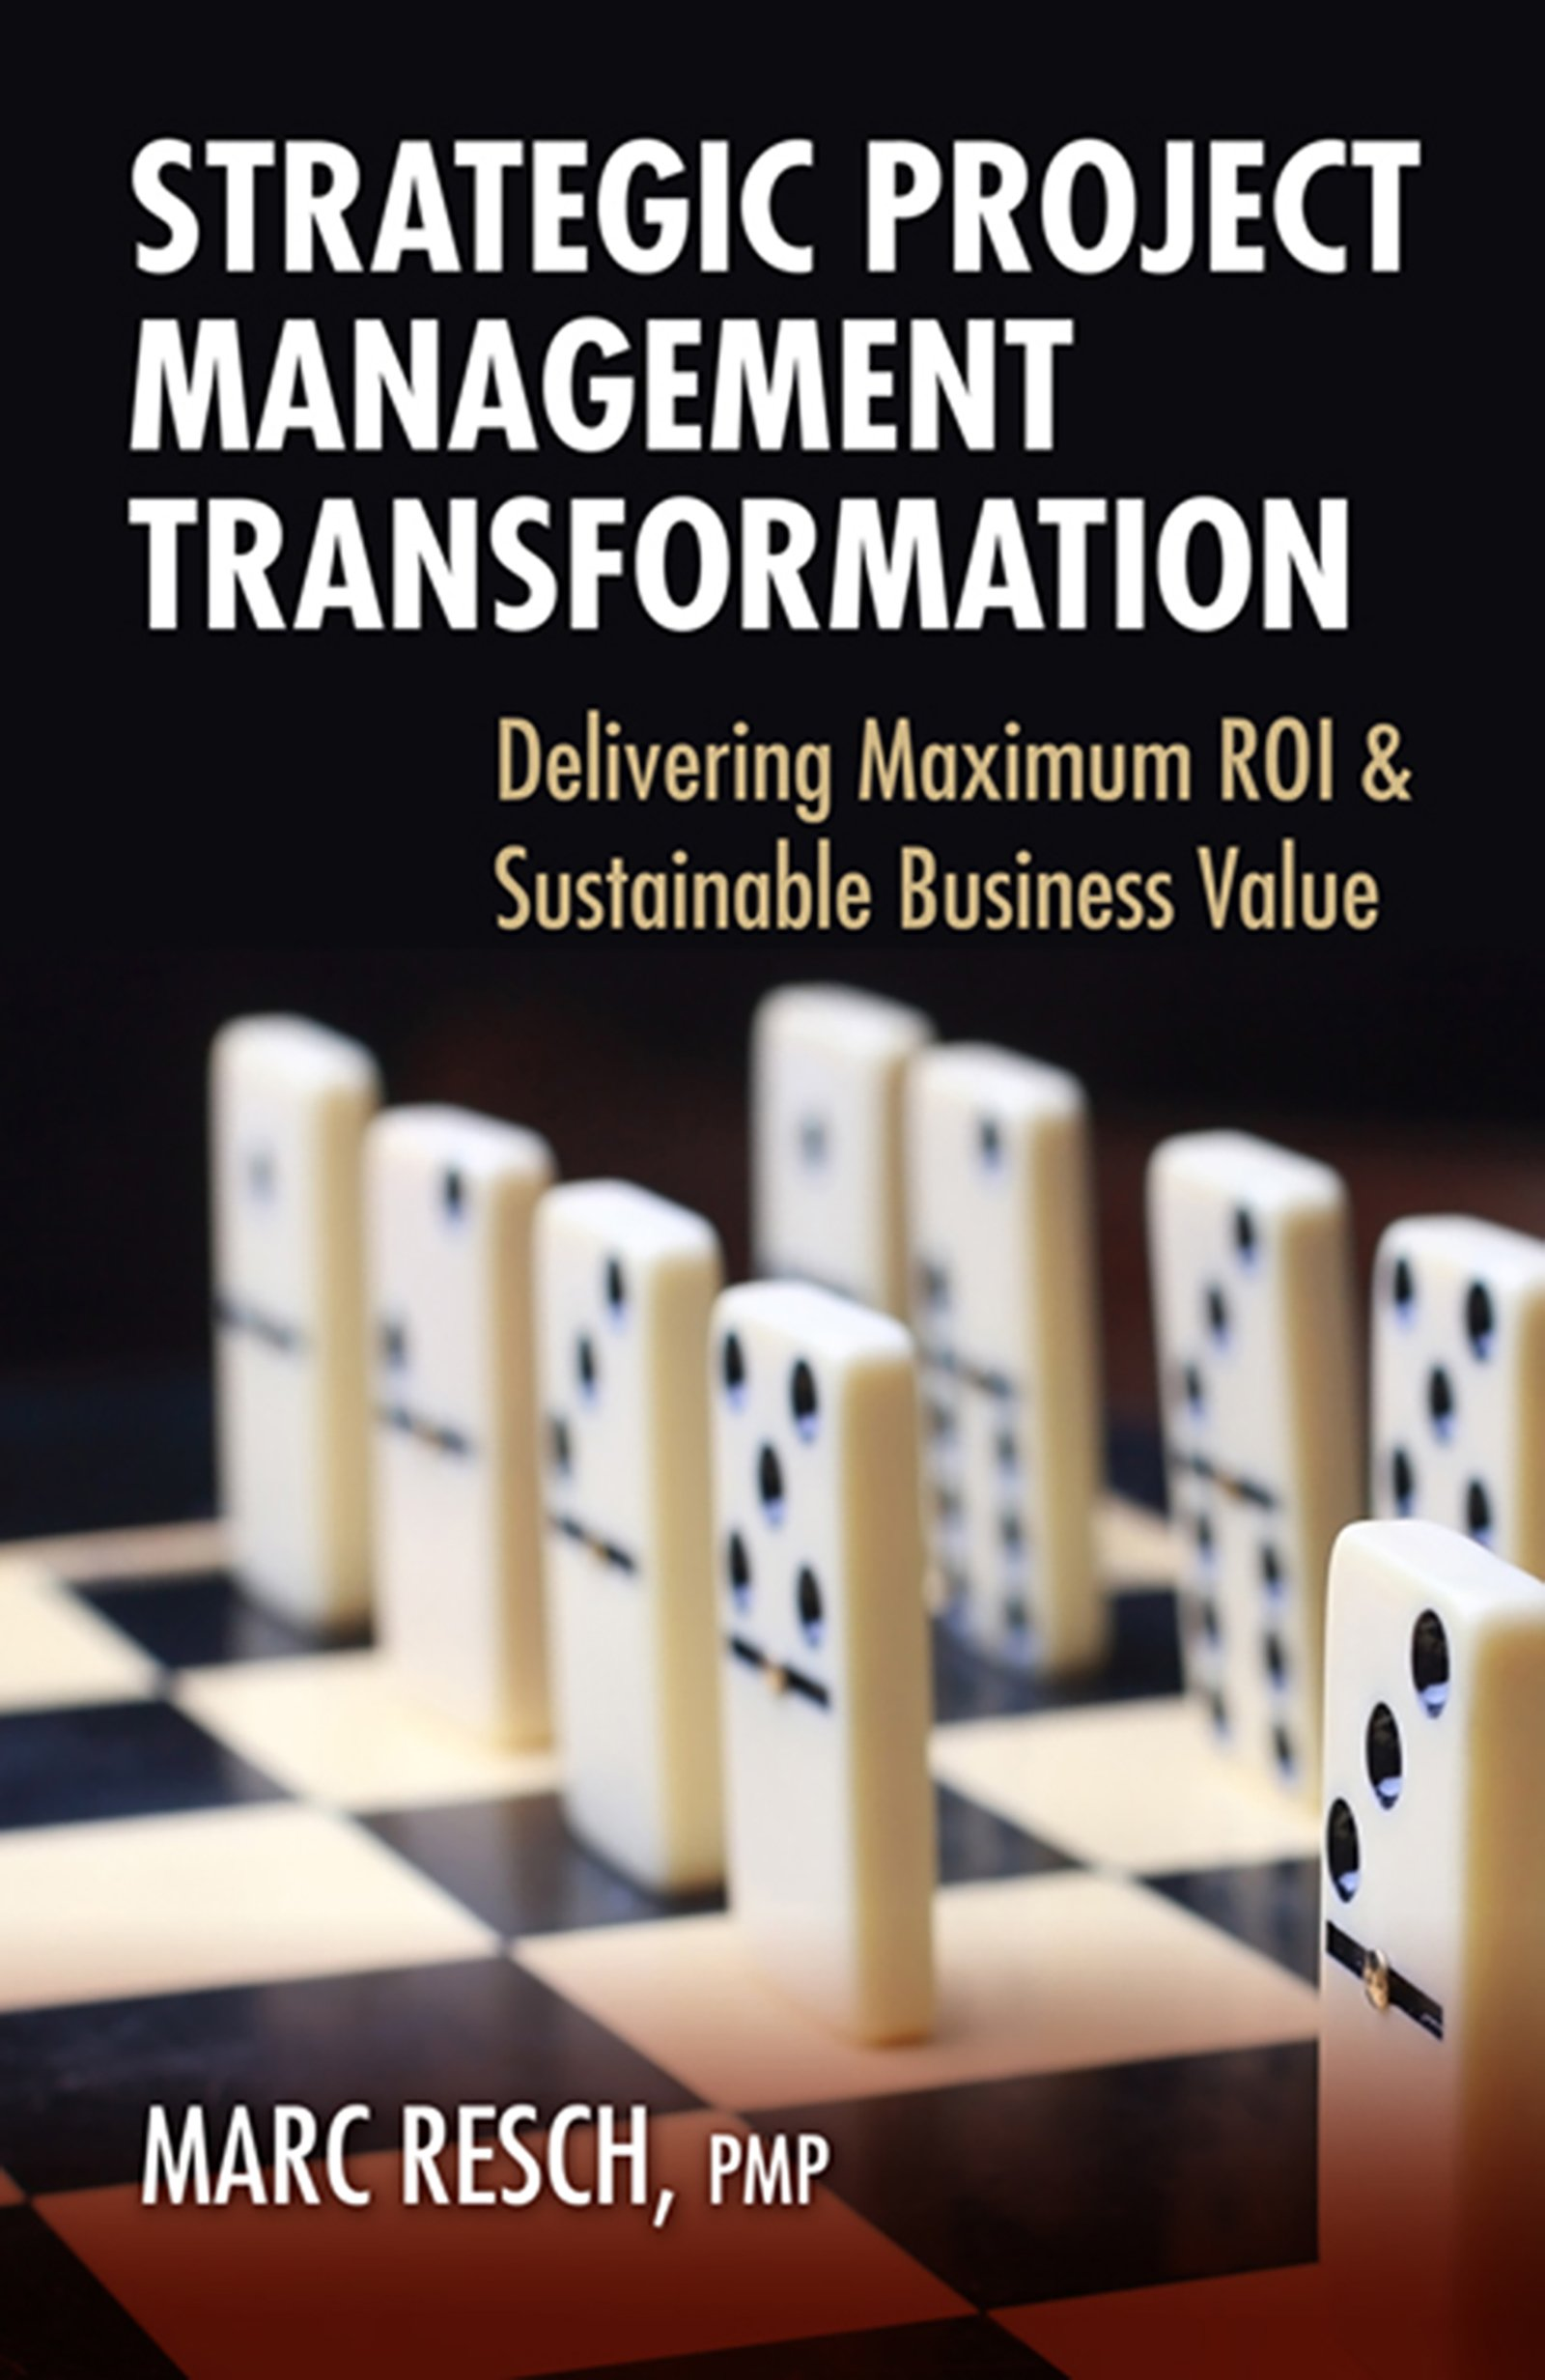 Amazon Com Strategic Project Management Transformation Delivering Maximum Roi Sustainable Business Value Delivering Maximum Roi Sustainable Business Value Ebook Resch Marc Kindle Store